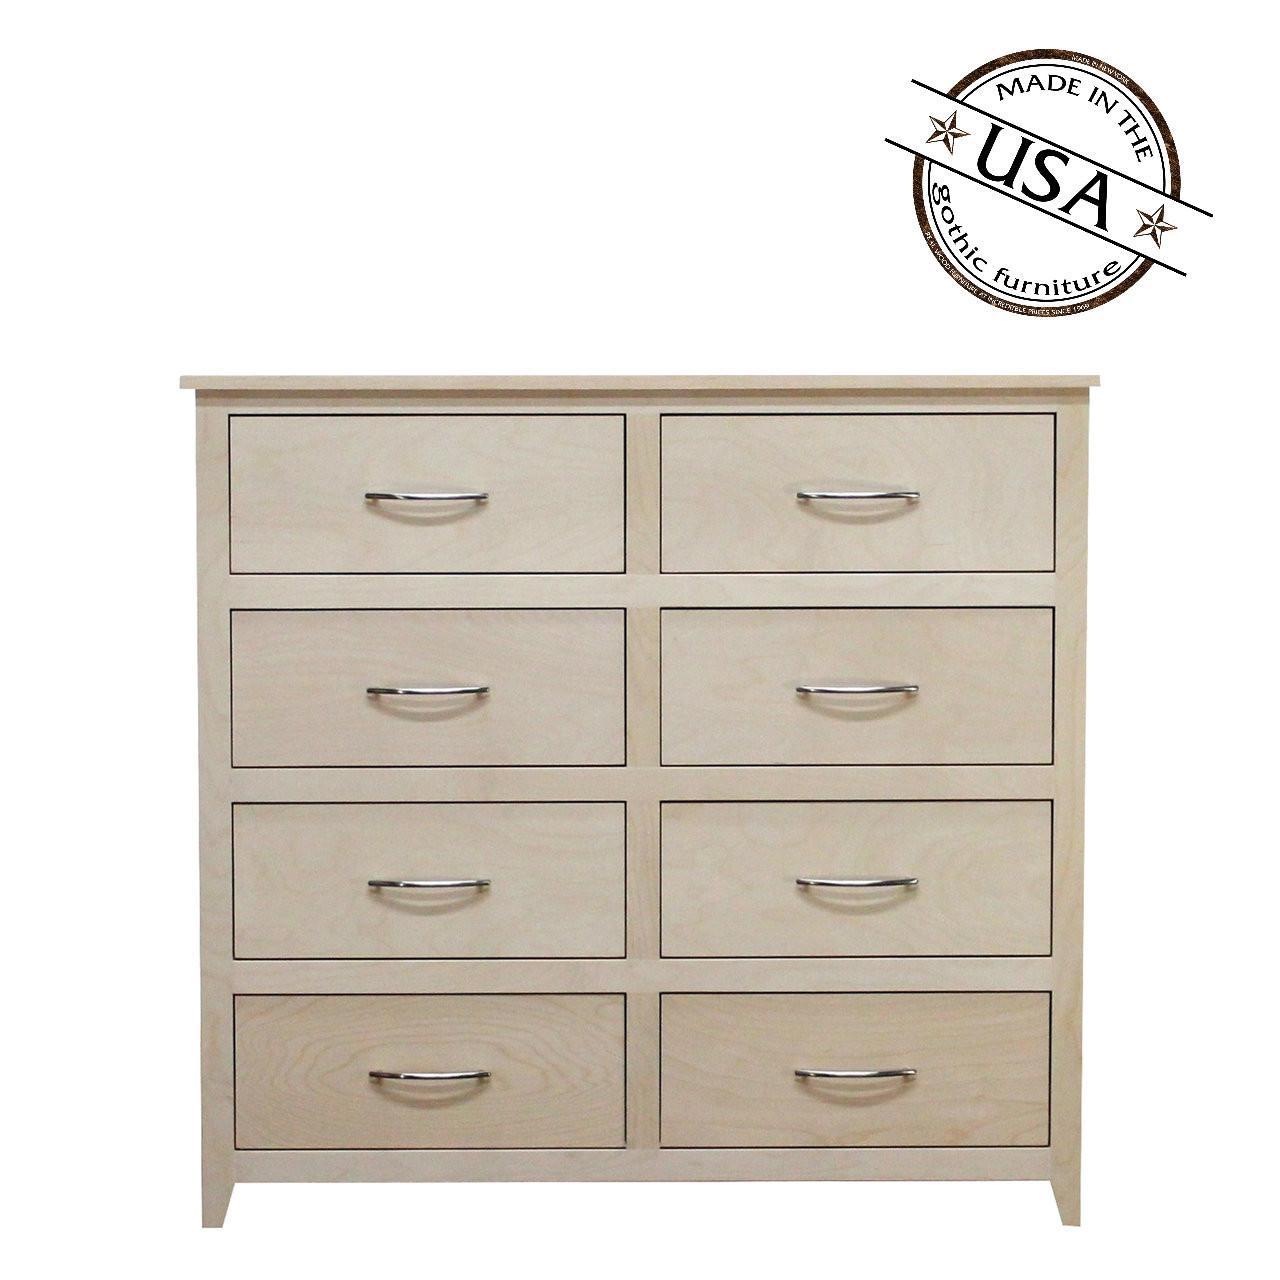 Dresser With Cabinet Douglaston 18 X 45 X 43